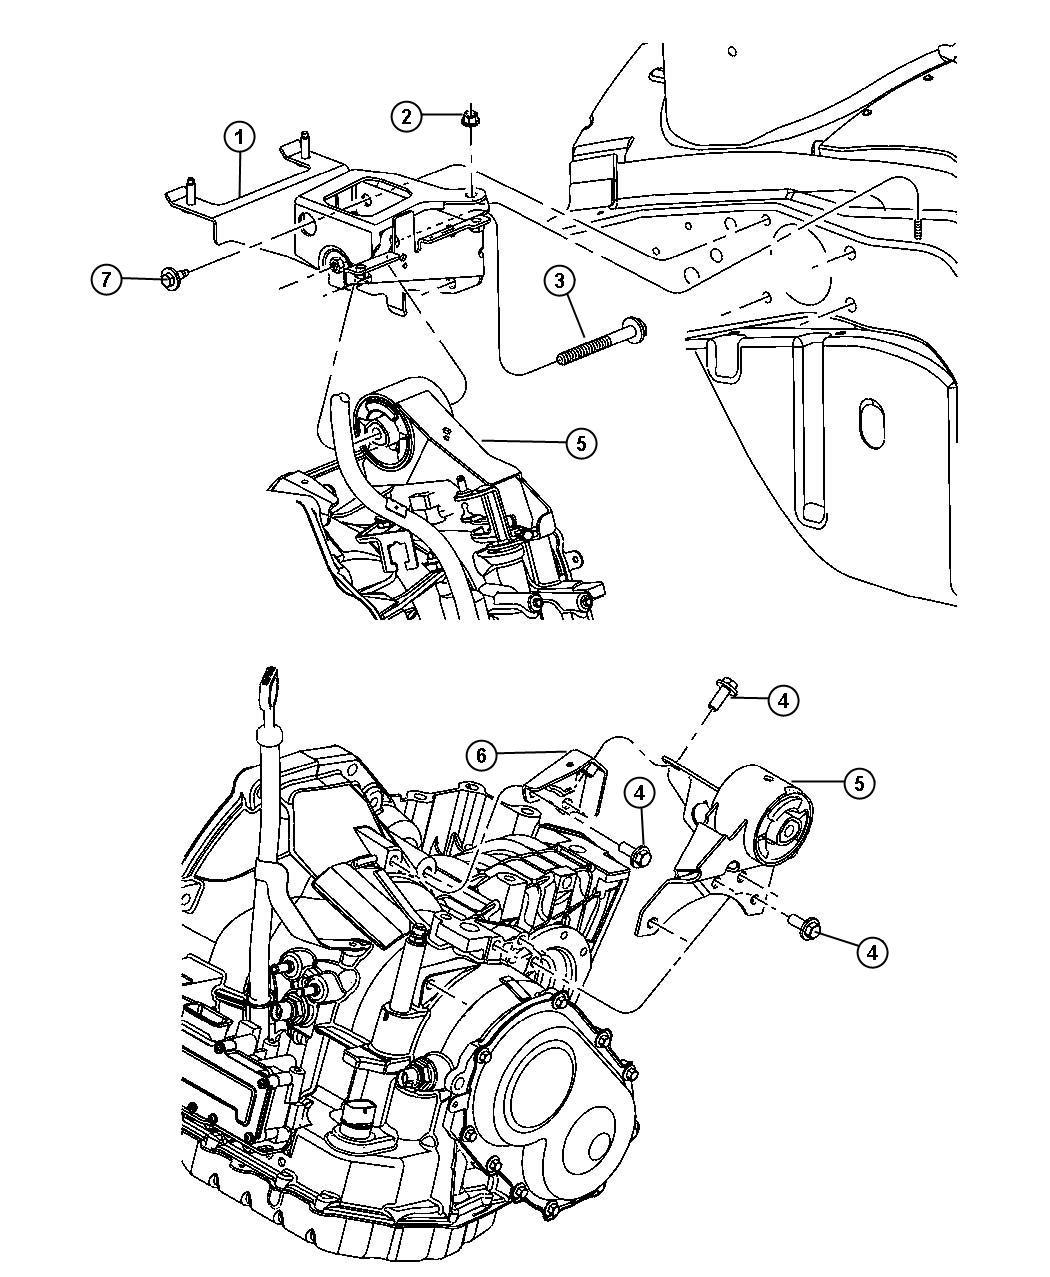 2003 Dodge Neon Support. Engine mount. Transmission to